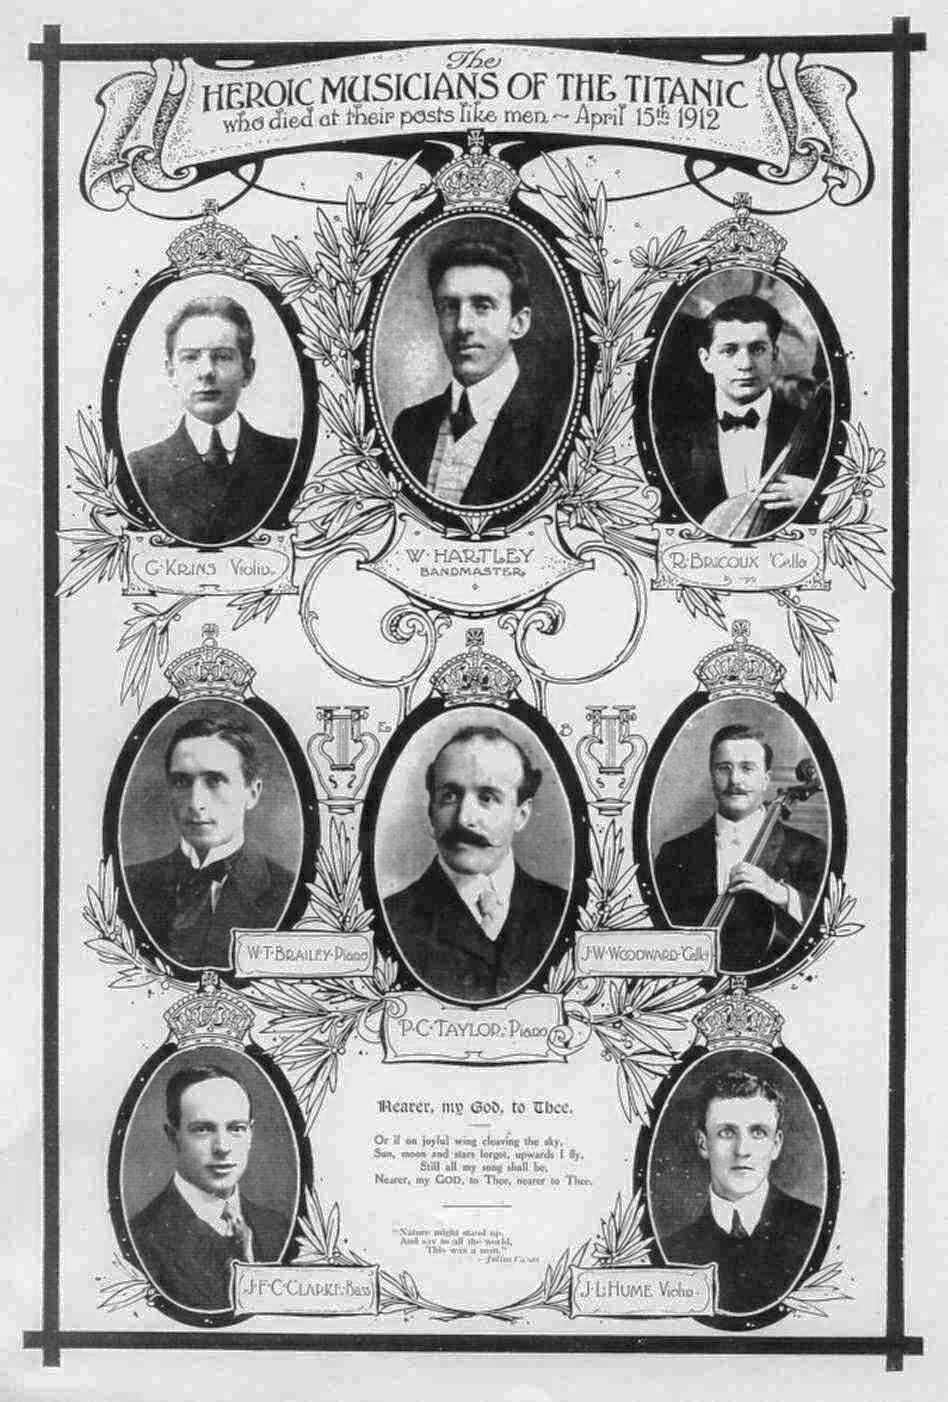 https://upload.wikimedia.org/wikipedia/commons/4/42/Titanic_Band.jpg